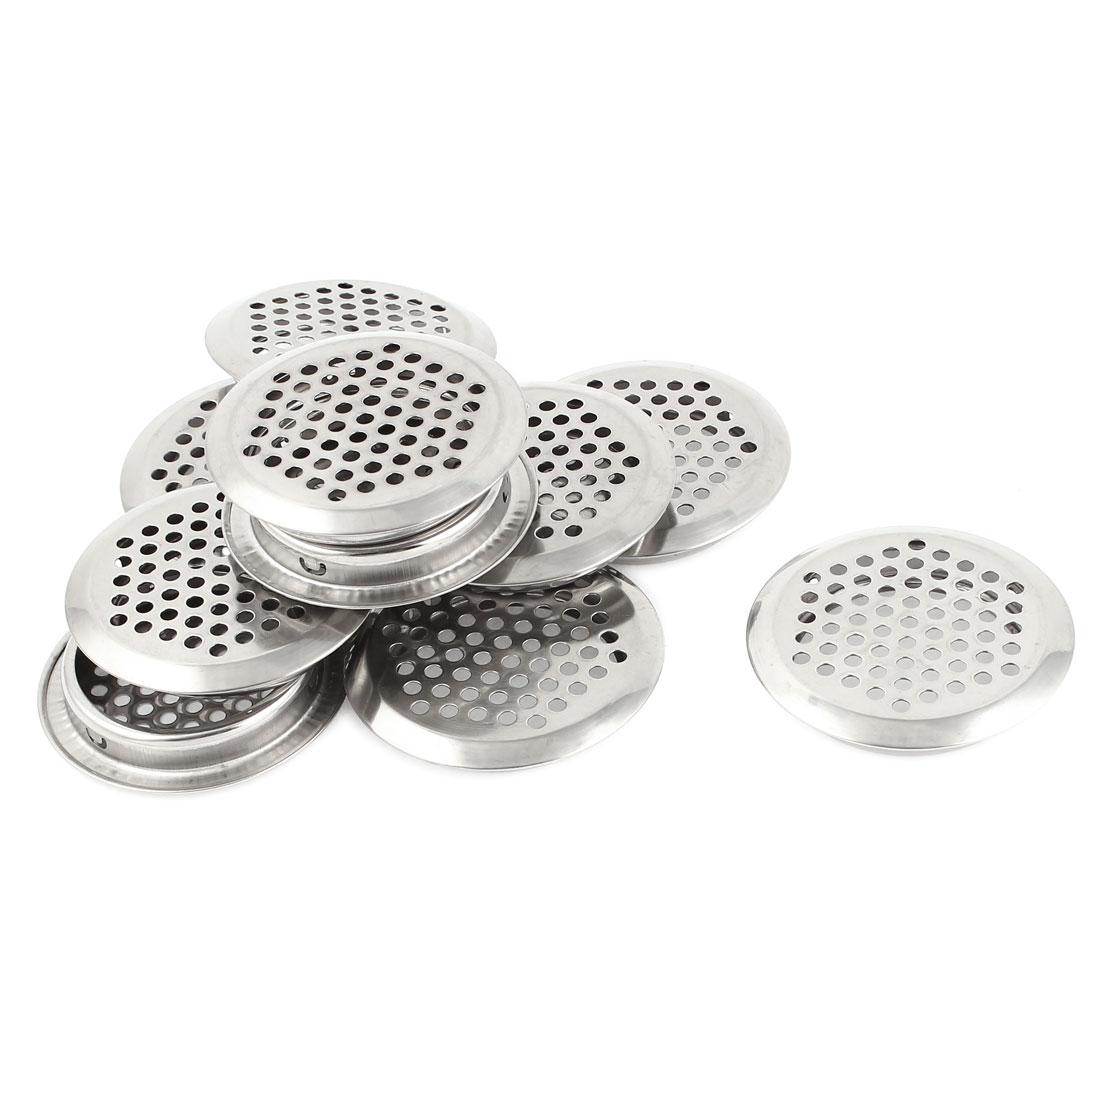 Kitchen Hardware Louver 52mm Bottom Dia Metal Round Design Air Vent 10 Pcs